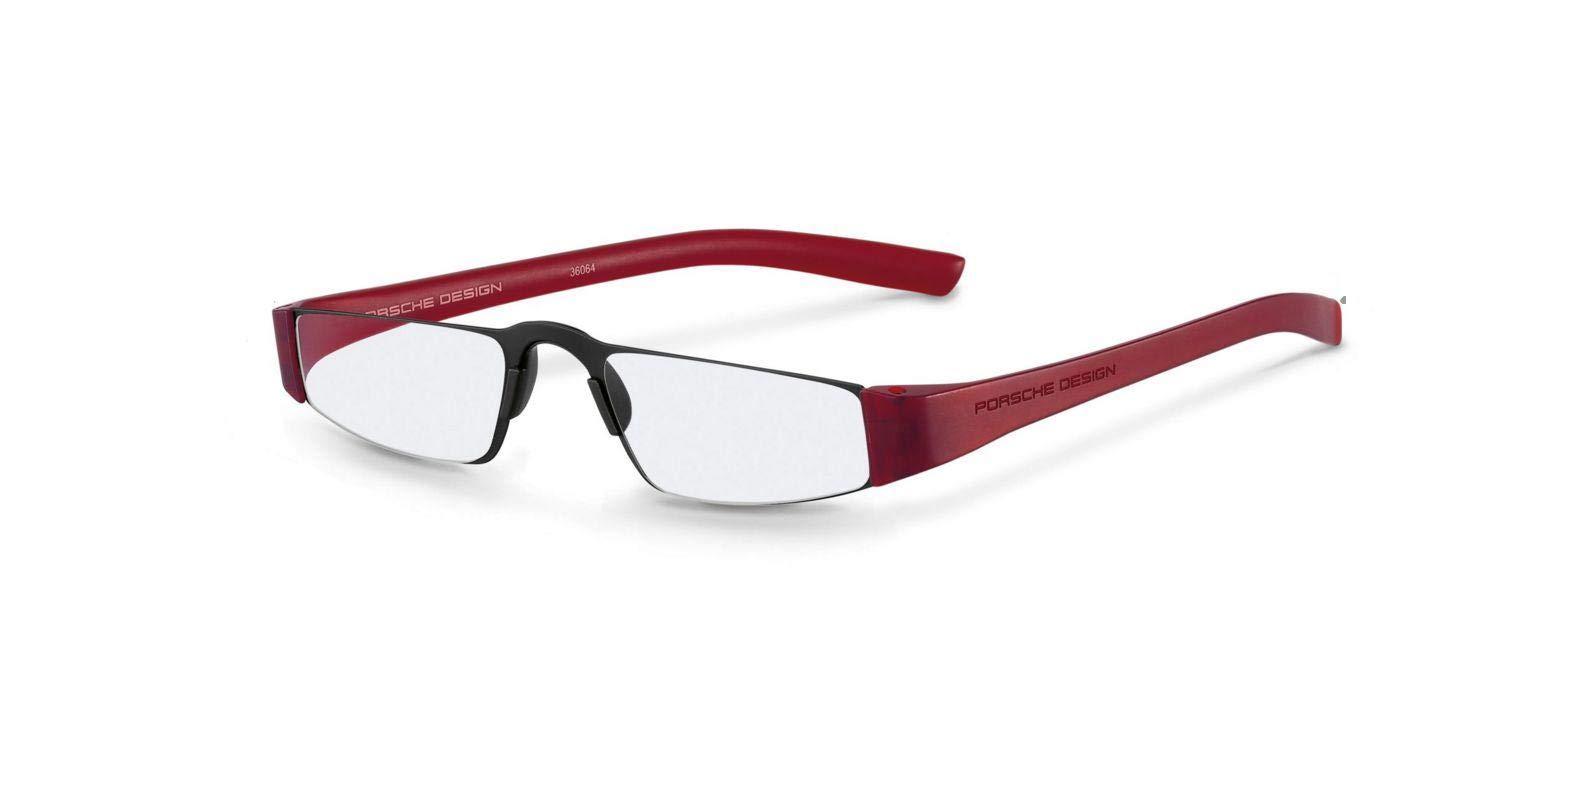 Authentic Porsche Design P 8801 B Black,Red +2.00 Reading Glasses